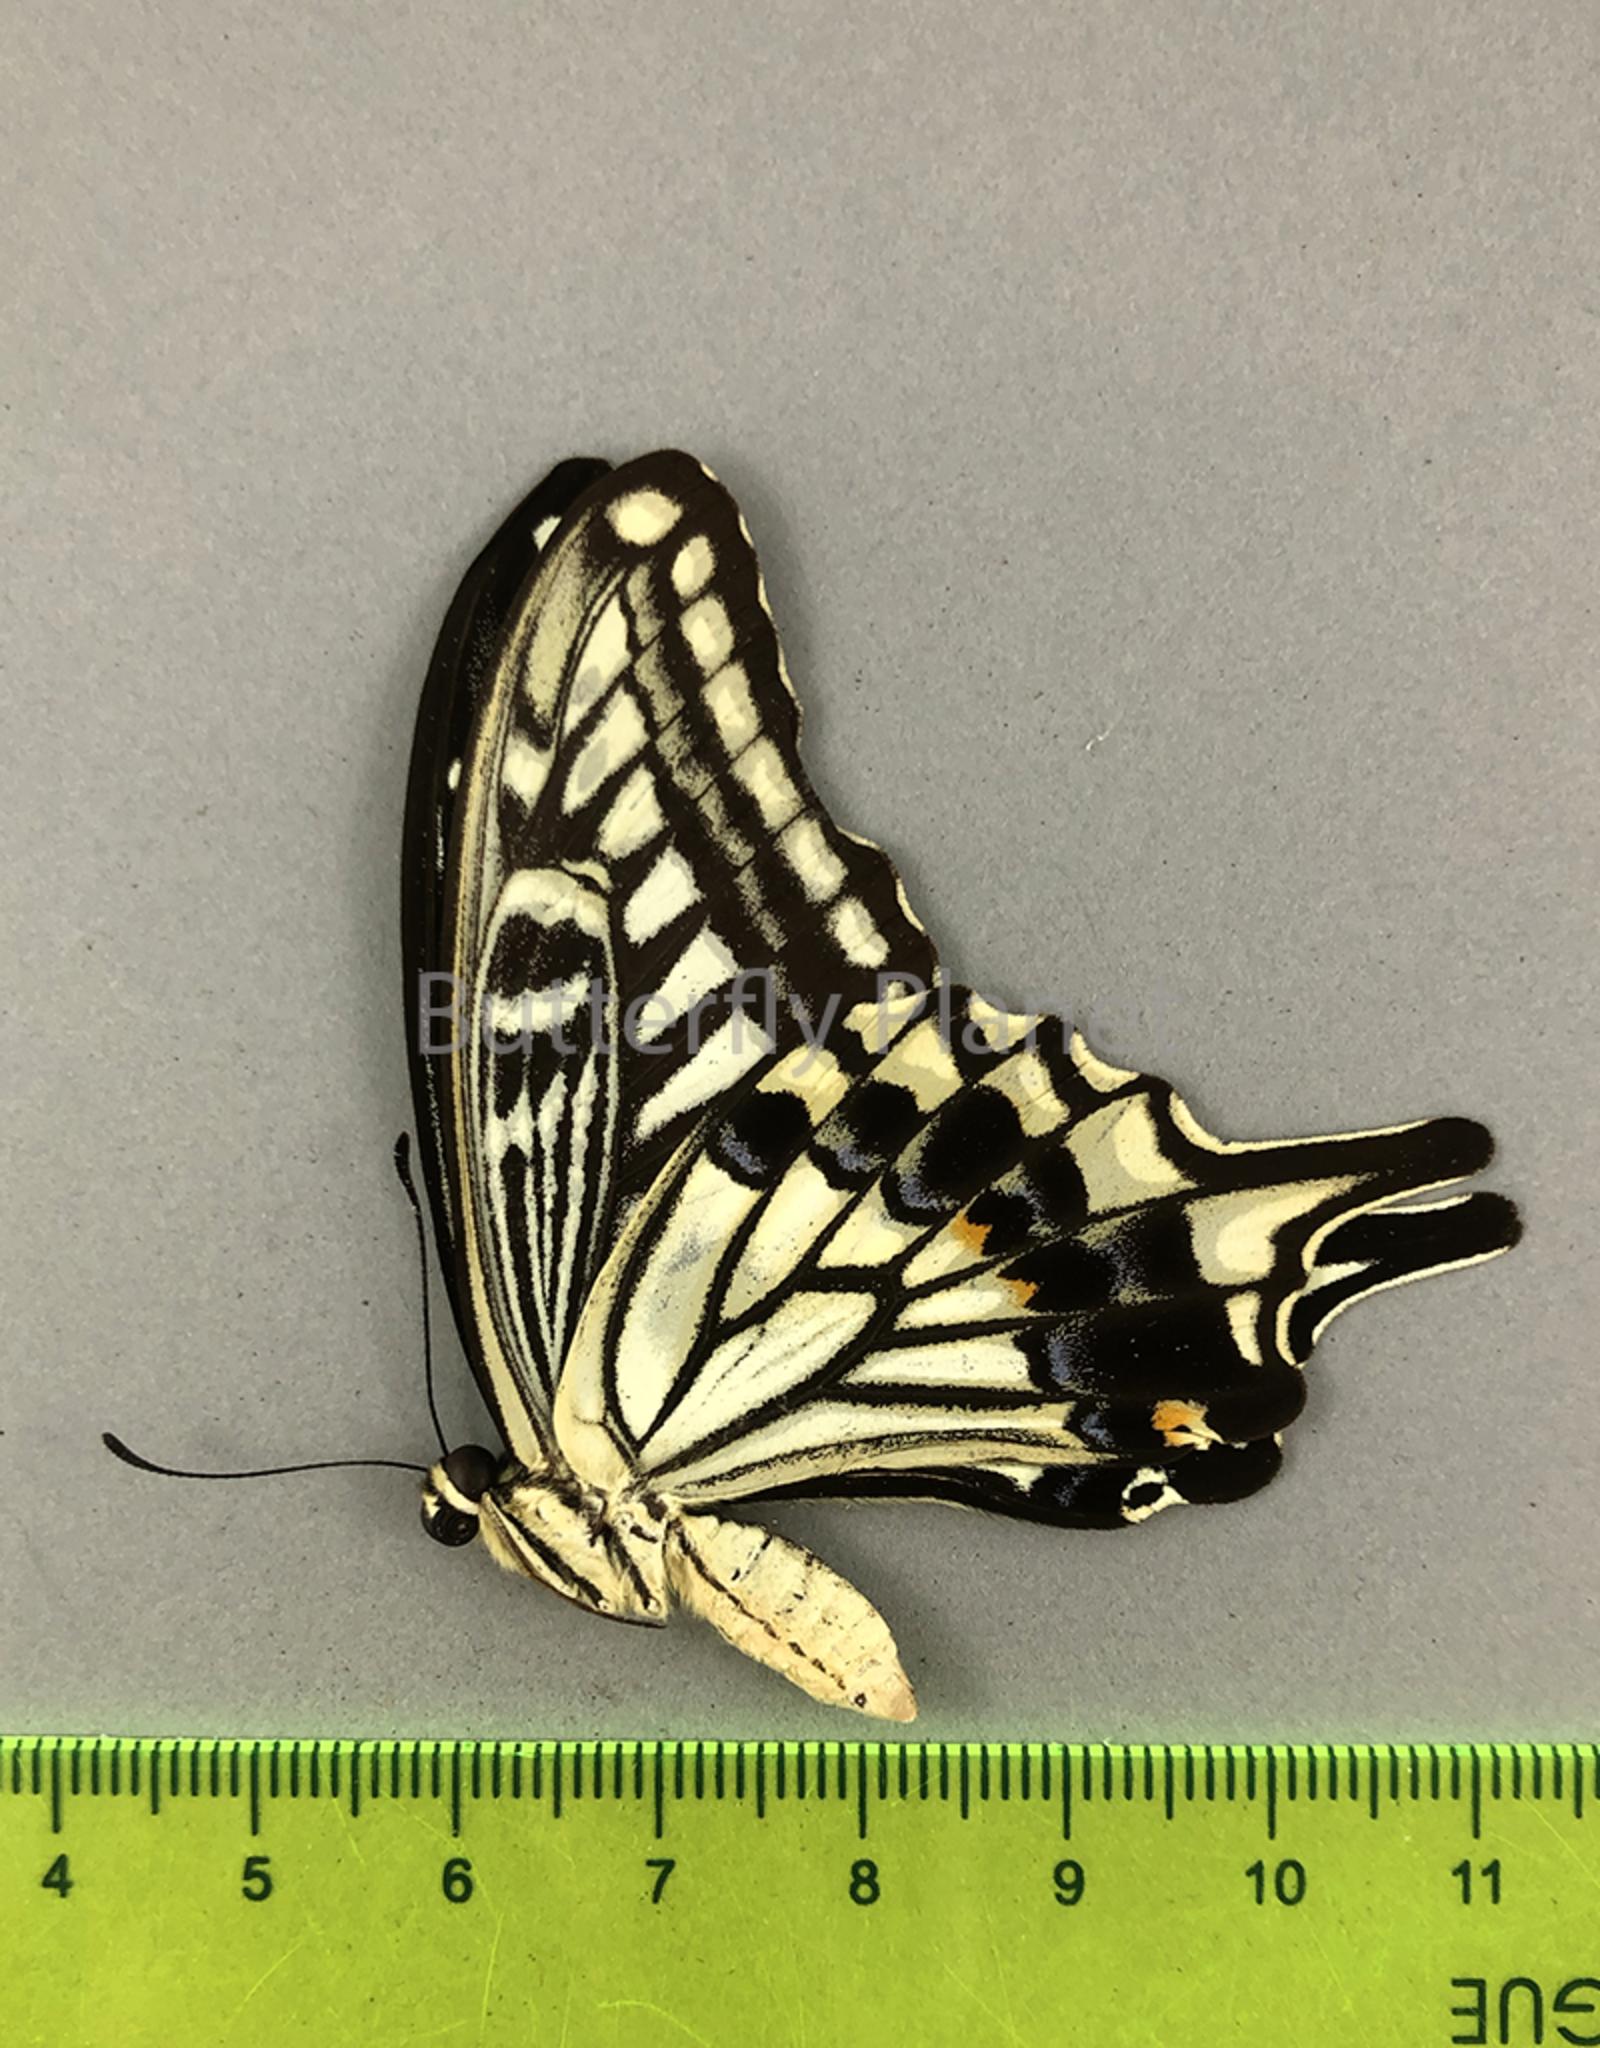 Papilio xuthus ssp? M A1 Szechuan/Sichuan, China